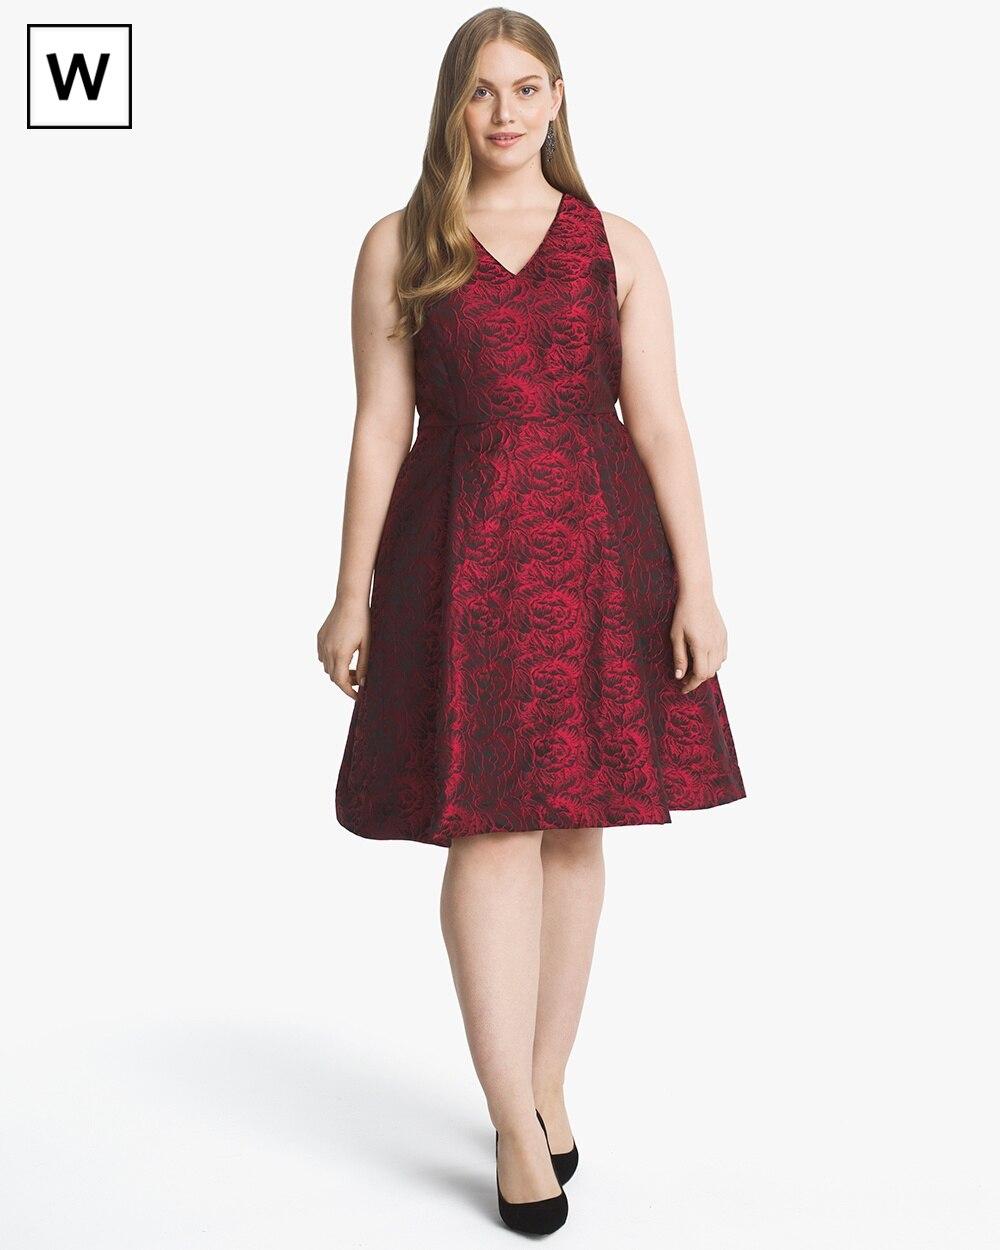 c06881a65a9c Plus Rose-Print Jacquard Fit-and-Flare Dress - White House Black Market